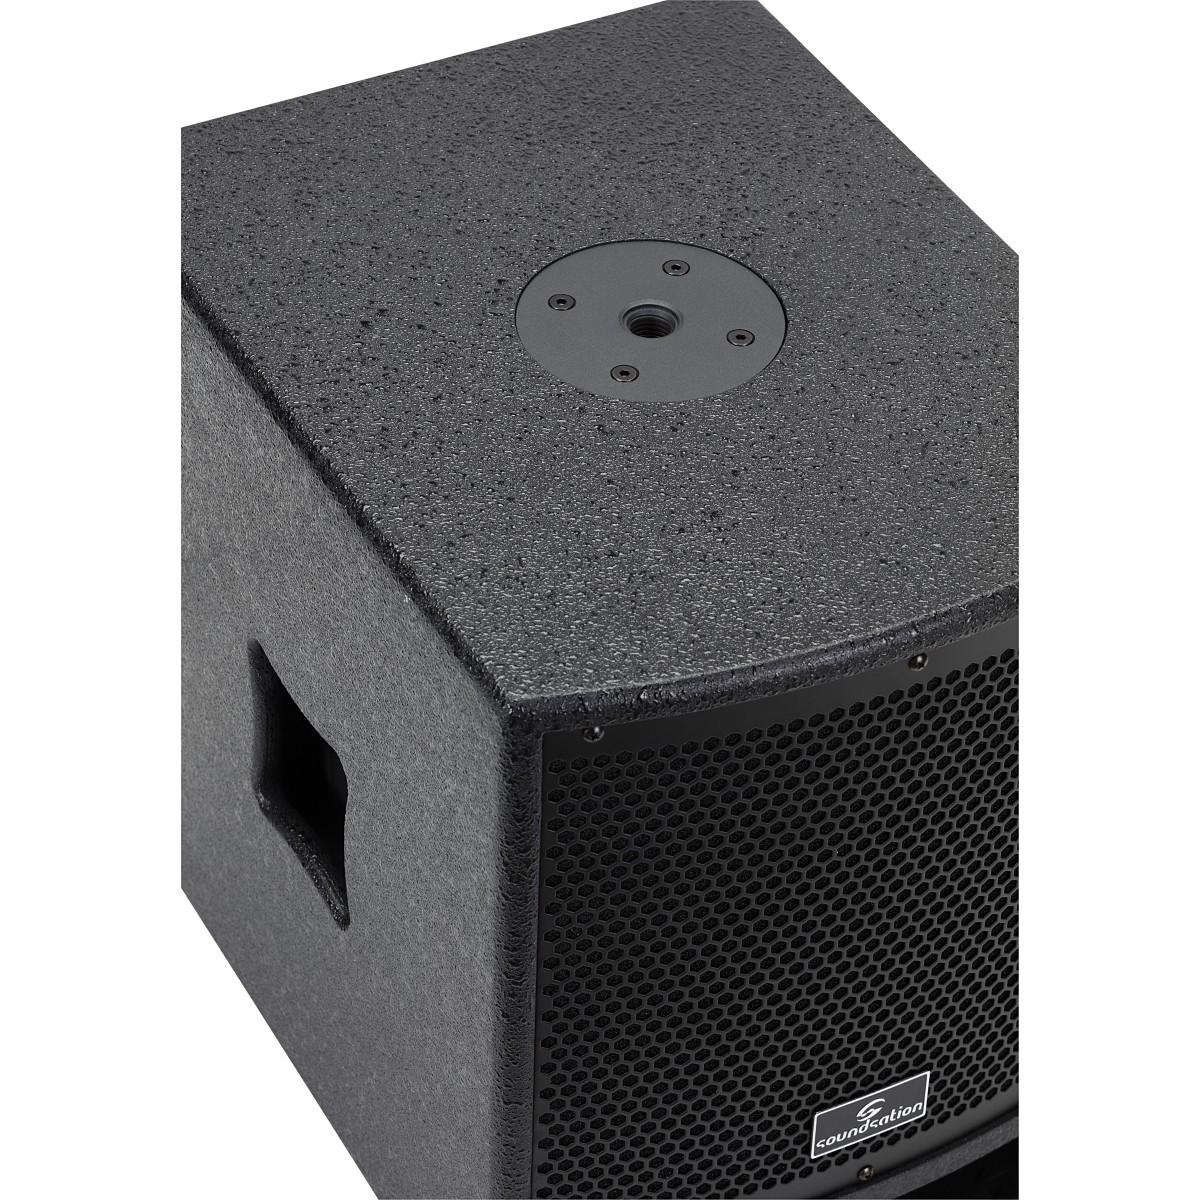 SISTEMA PA 2.1 SOUNDSATION LIVEMAKER 1021 MIX 900W. 2x6.5